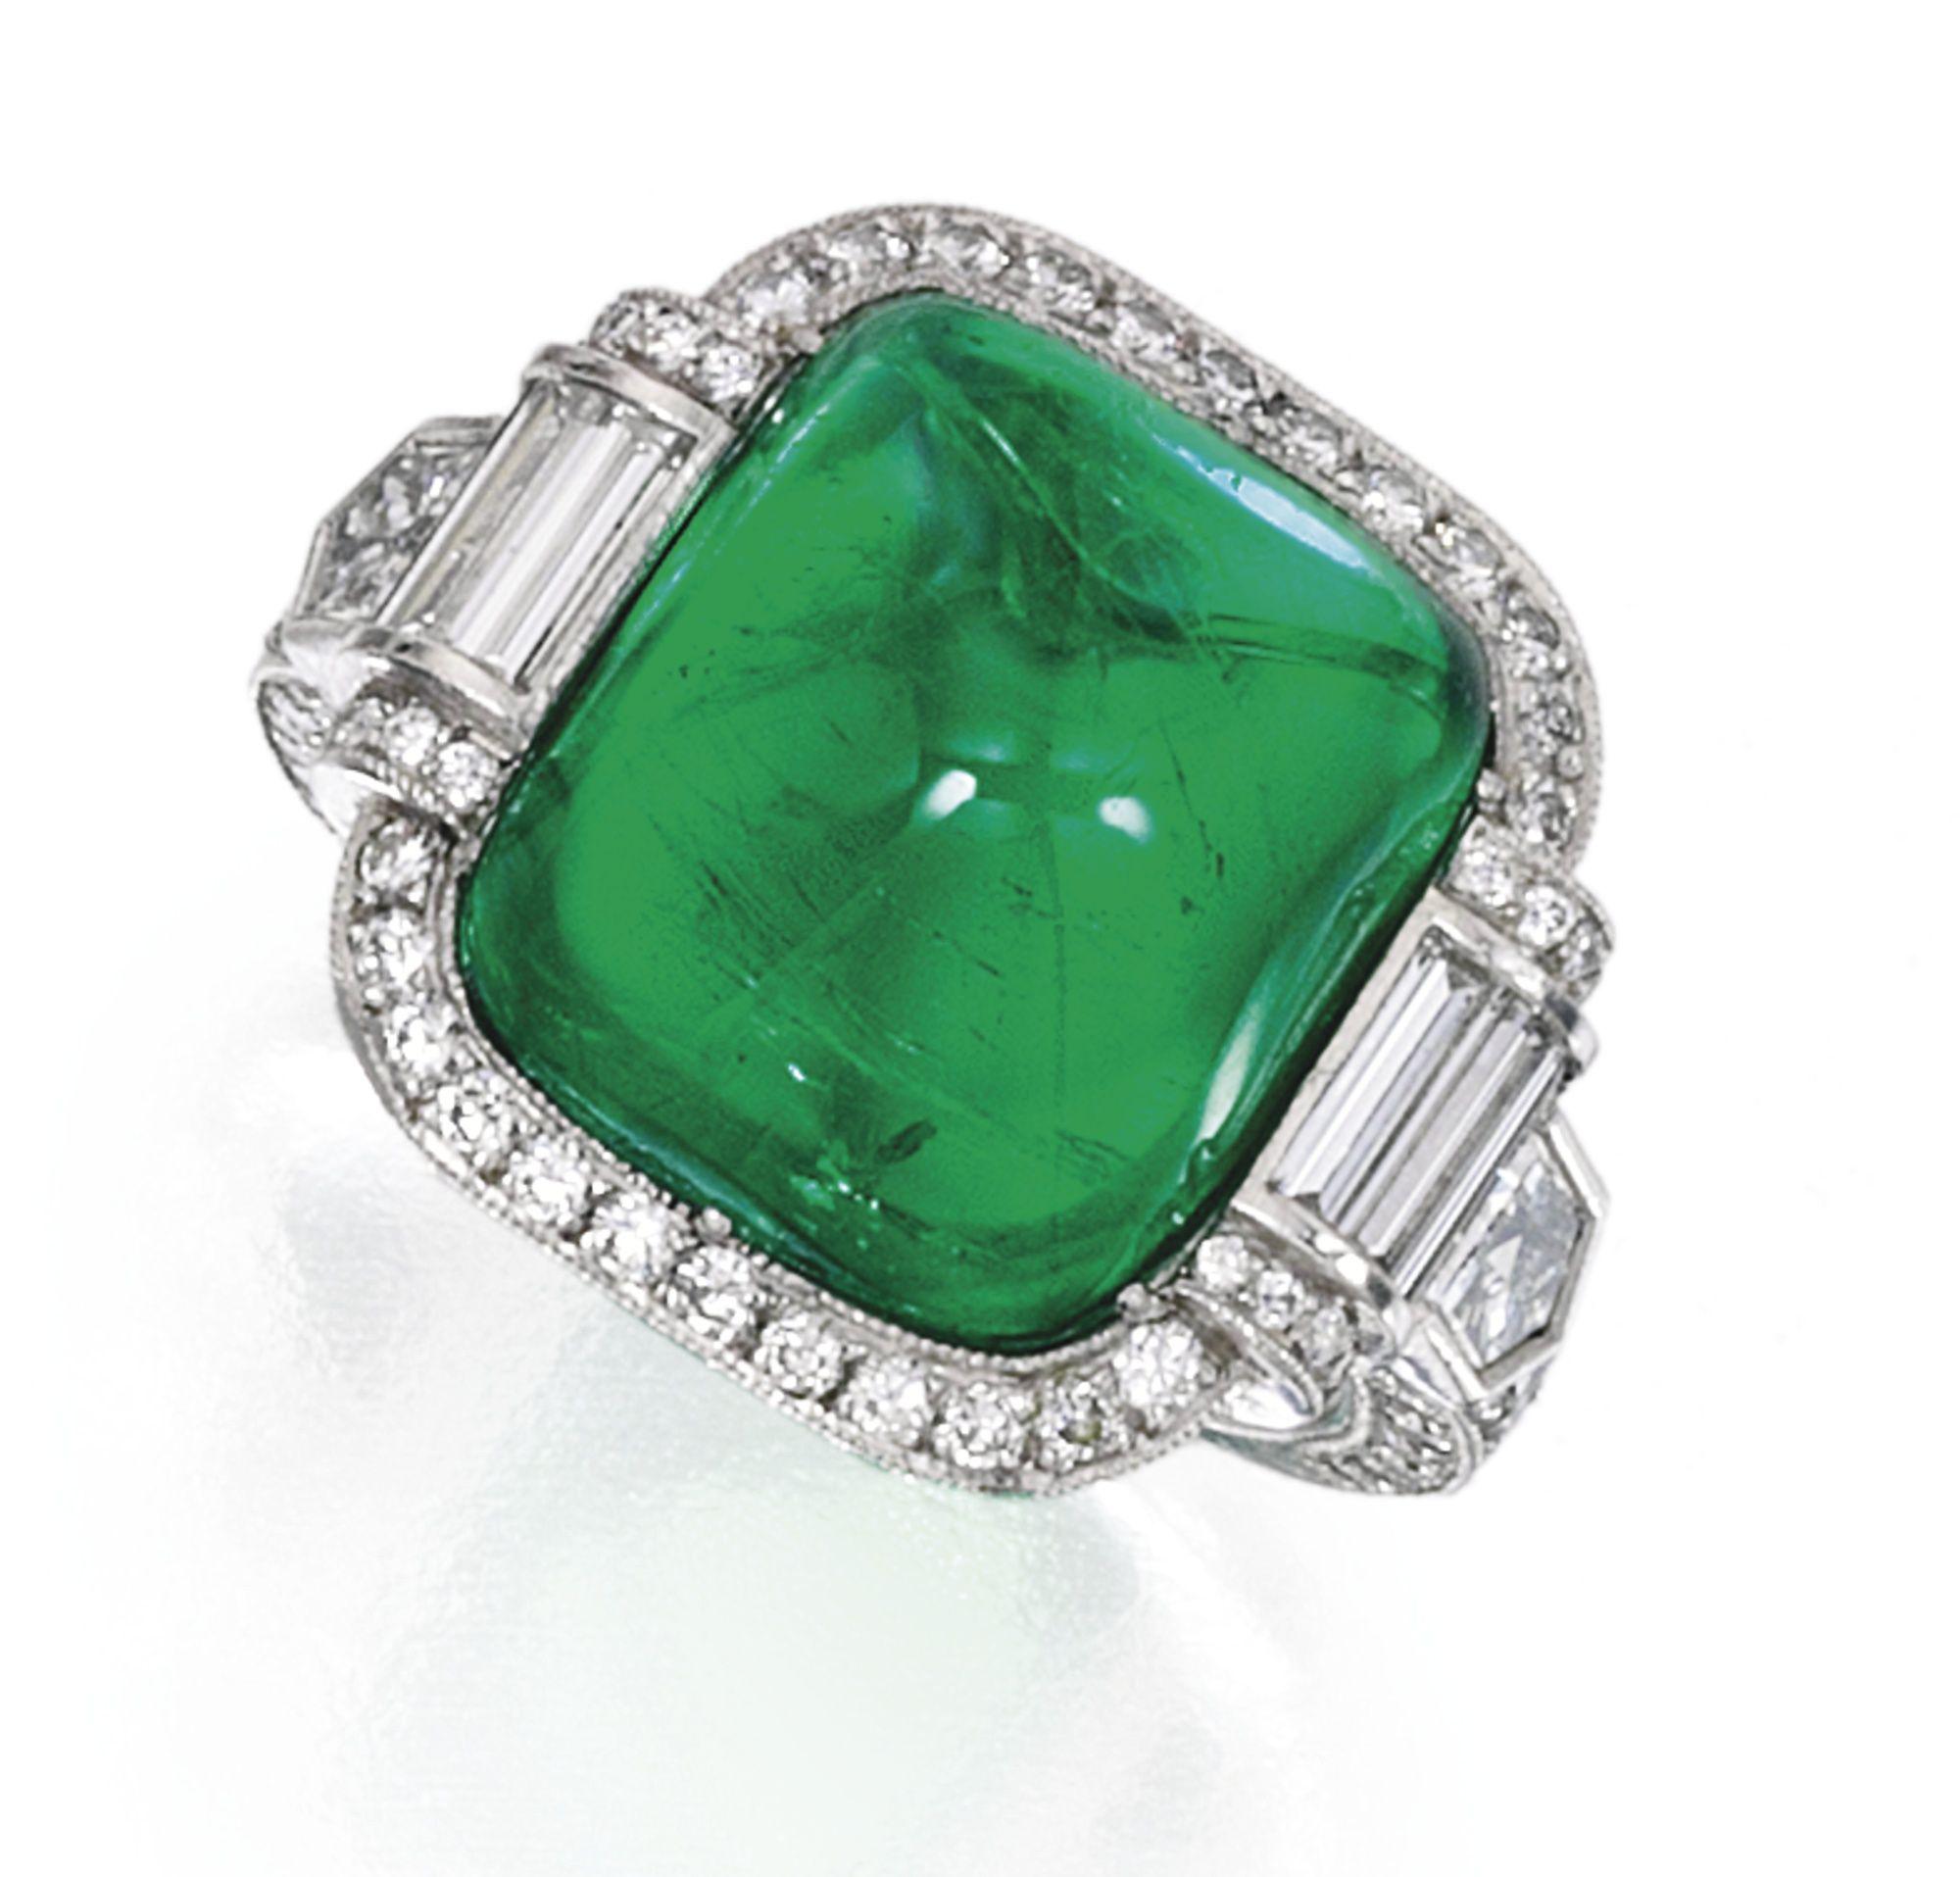 16 Carat Asscher Cut Emerald /& Edwardian Diamond Ring With 925 Sterling Silver